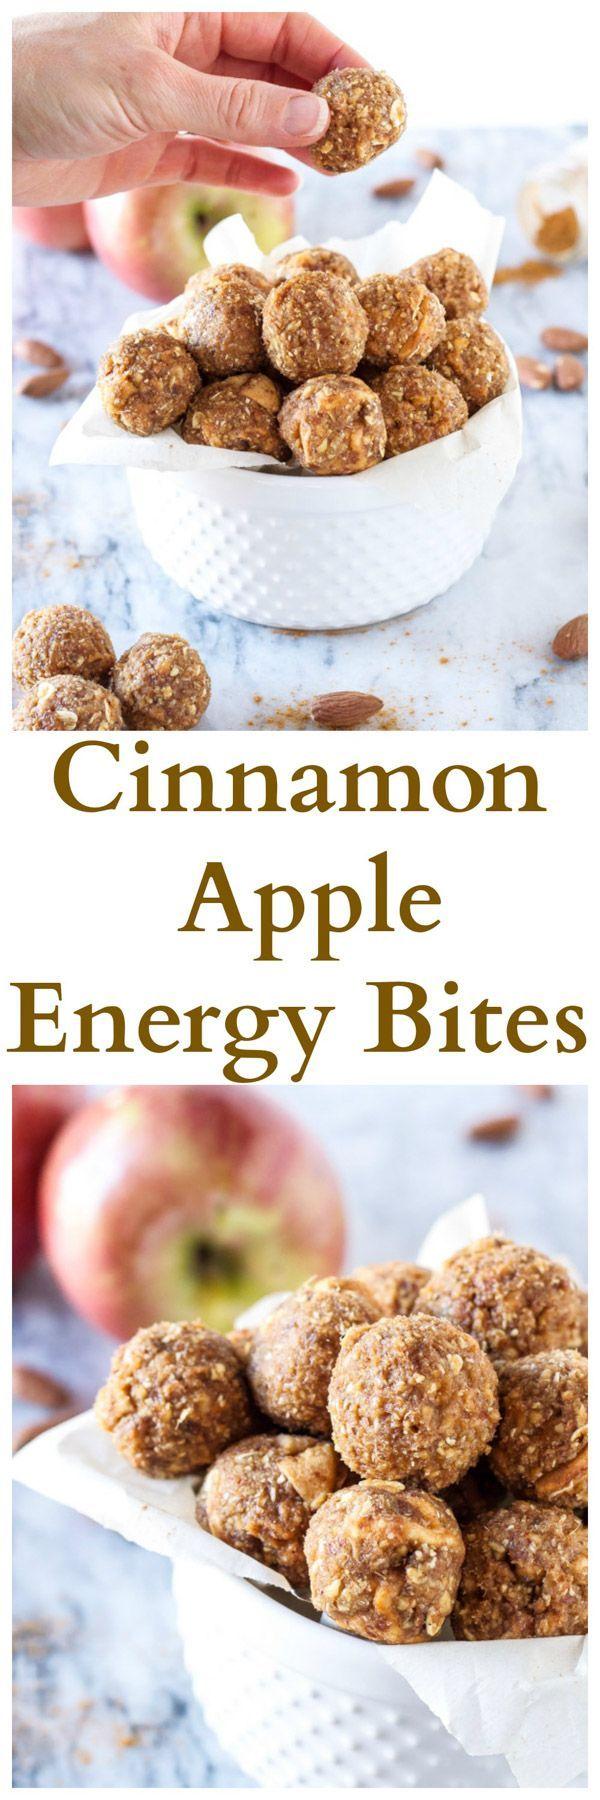 Cinnamon Apple Energy Bites - Healthy, gluten free, vegan, energy bites